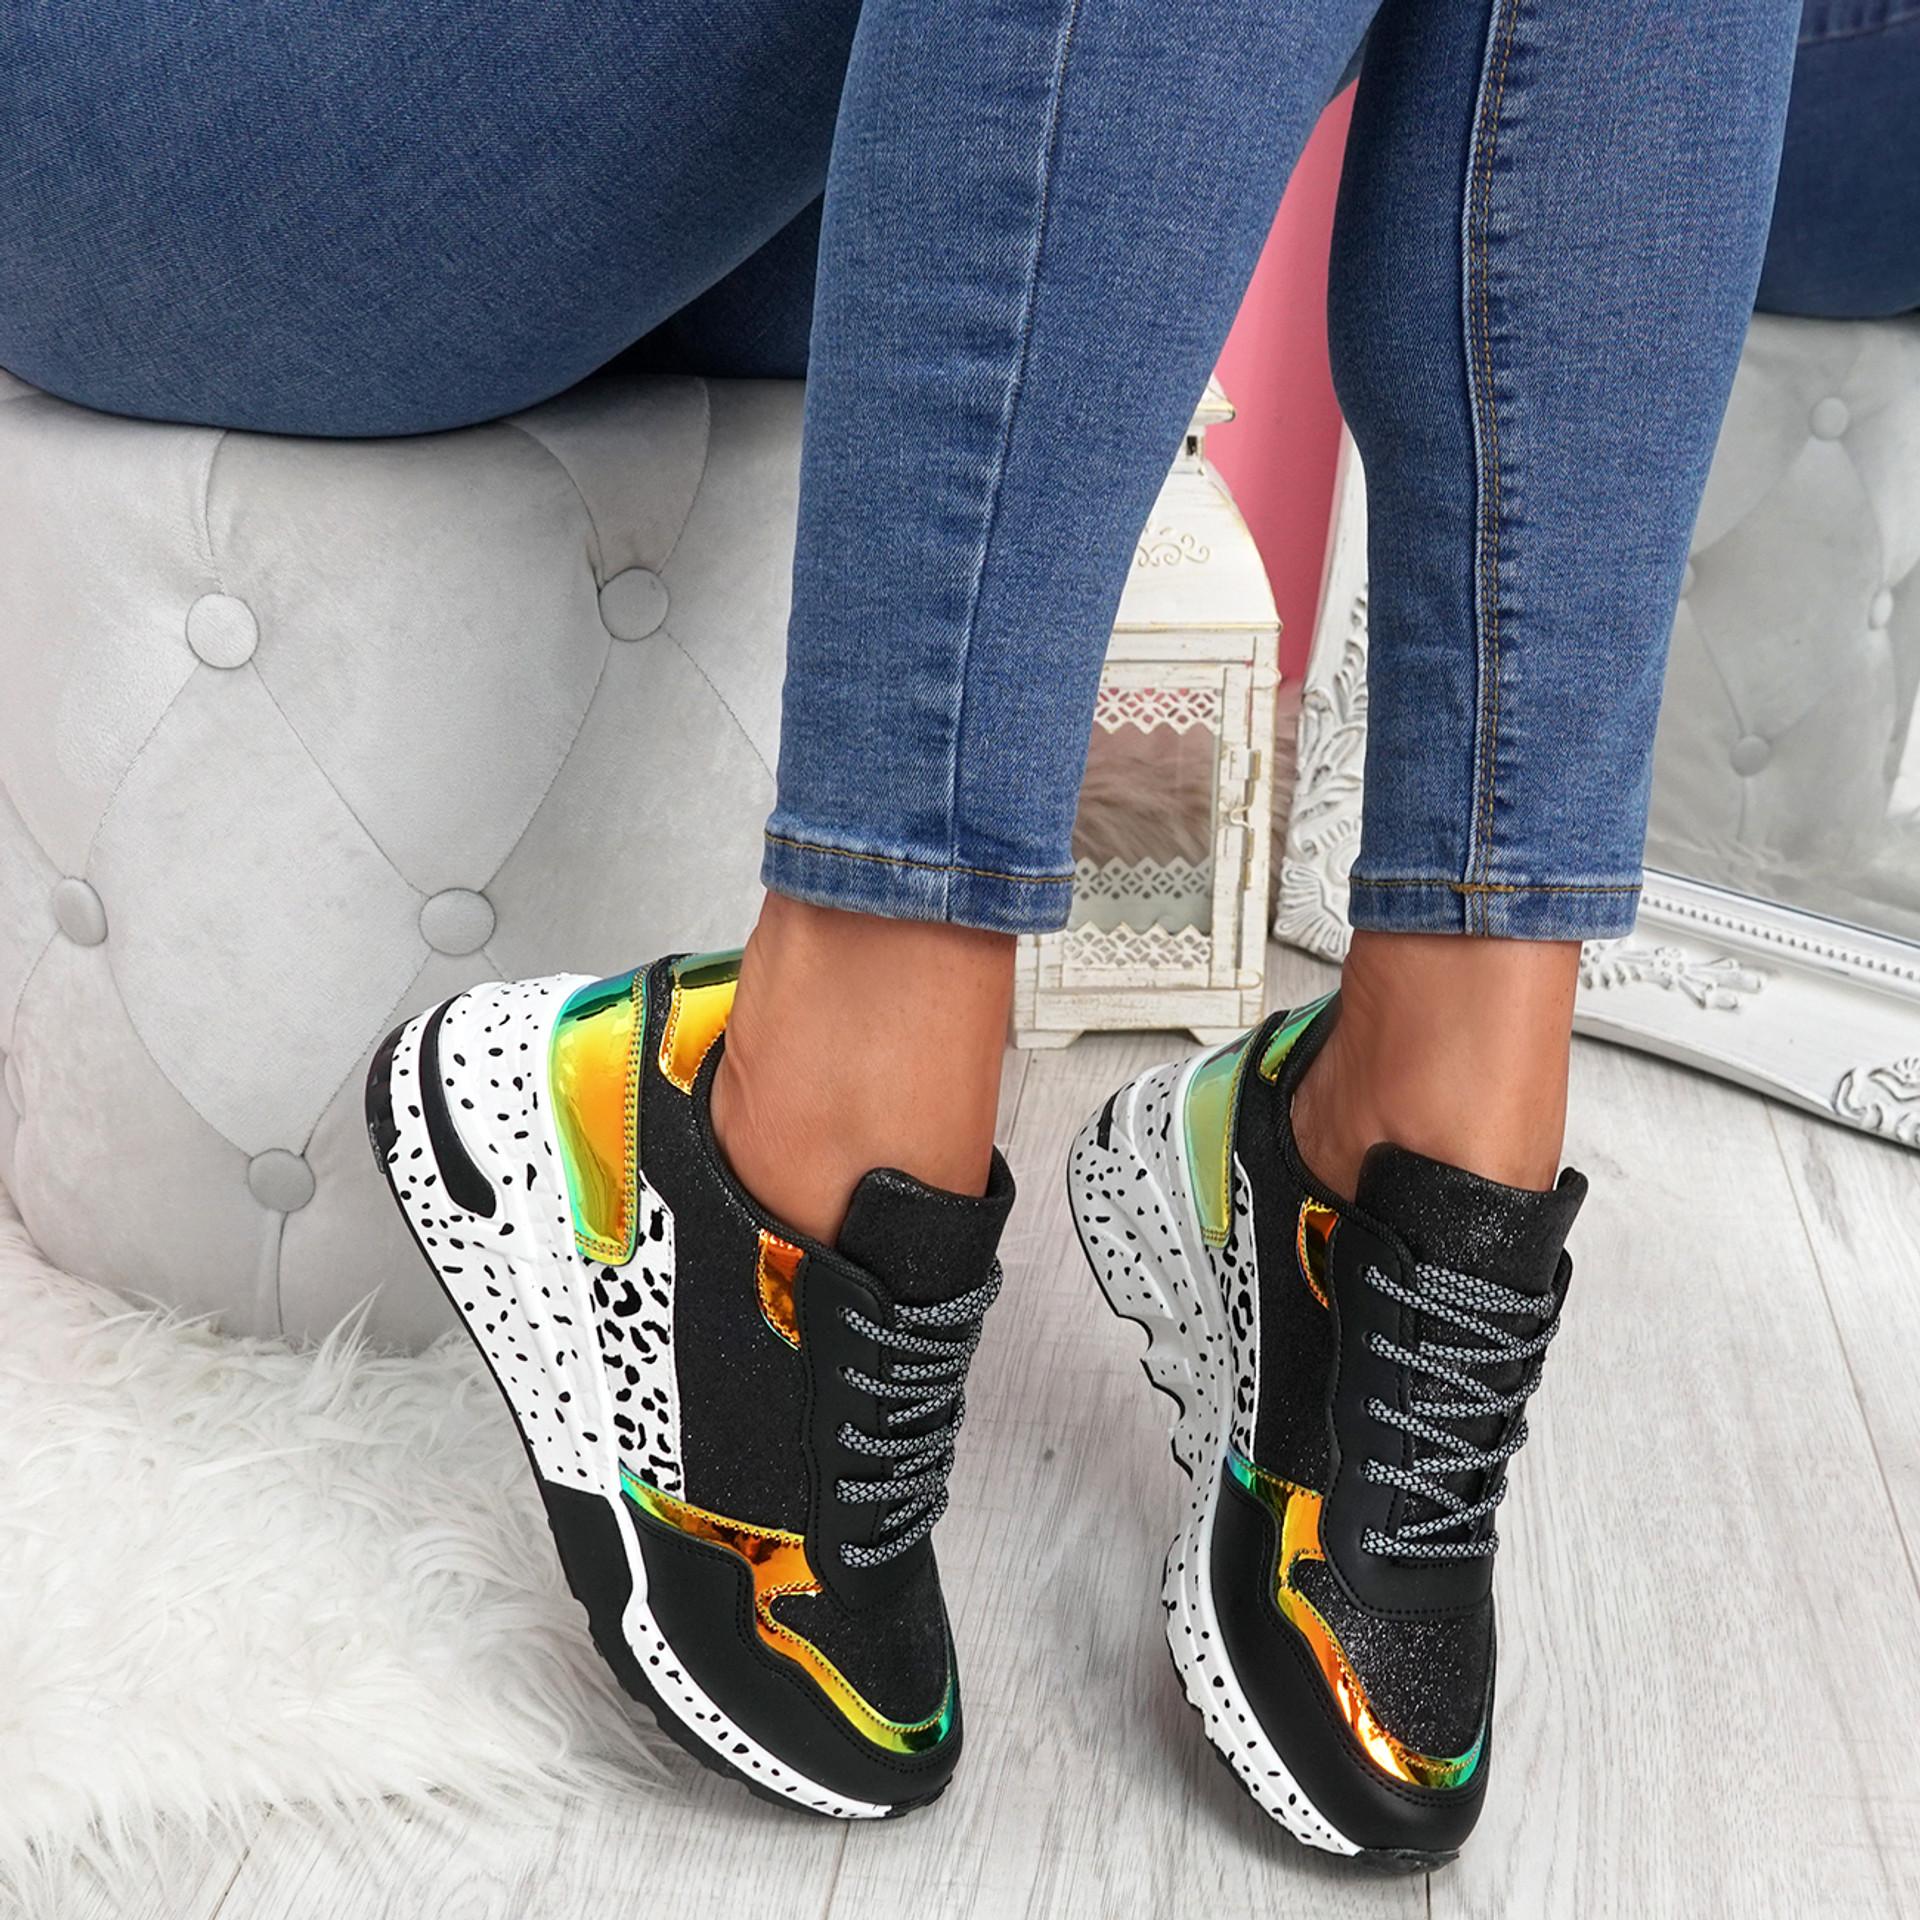 Zinna Black Glitter Chunky Sneakers